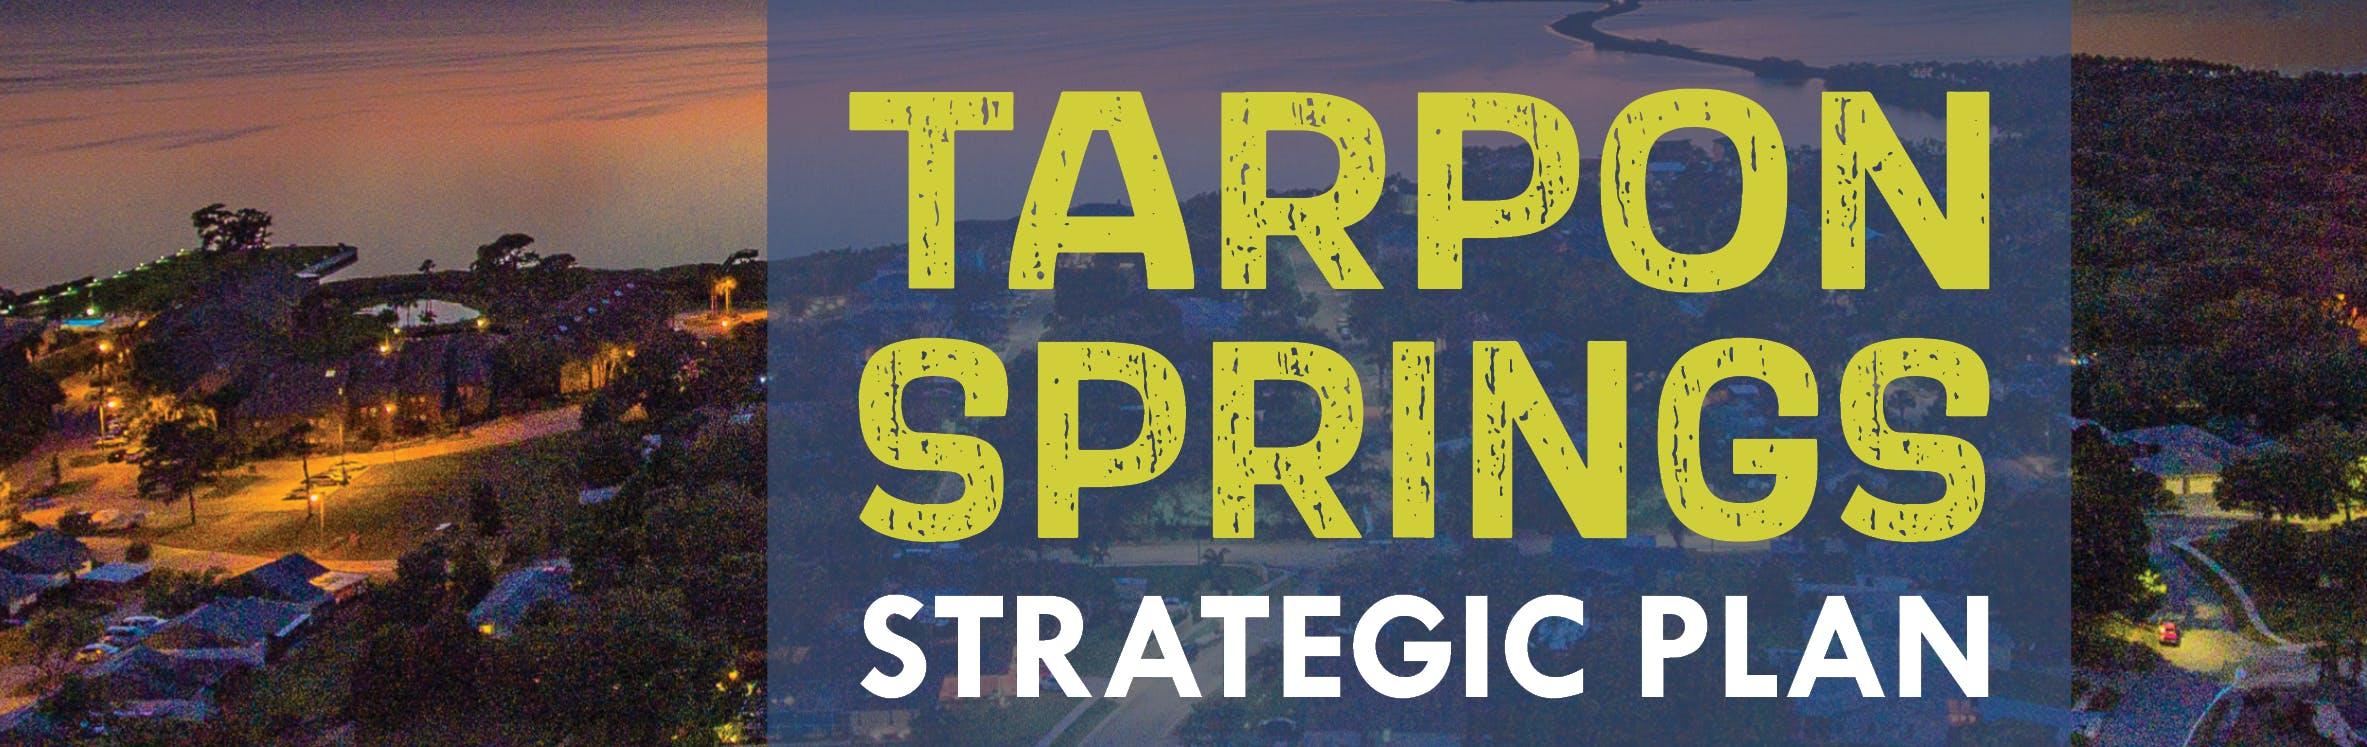 Aerial Image of Tarpon Springs at Night